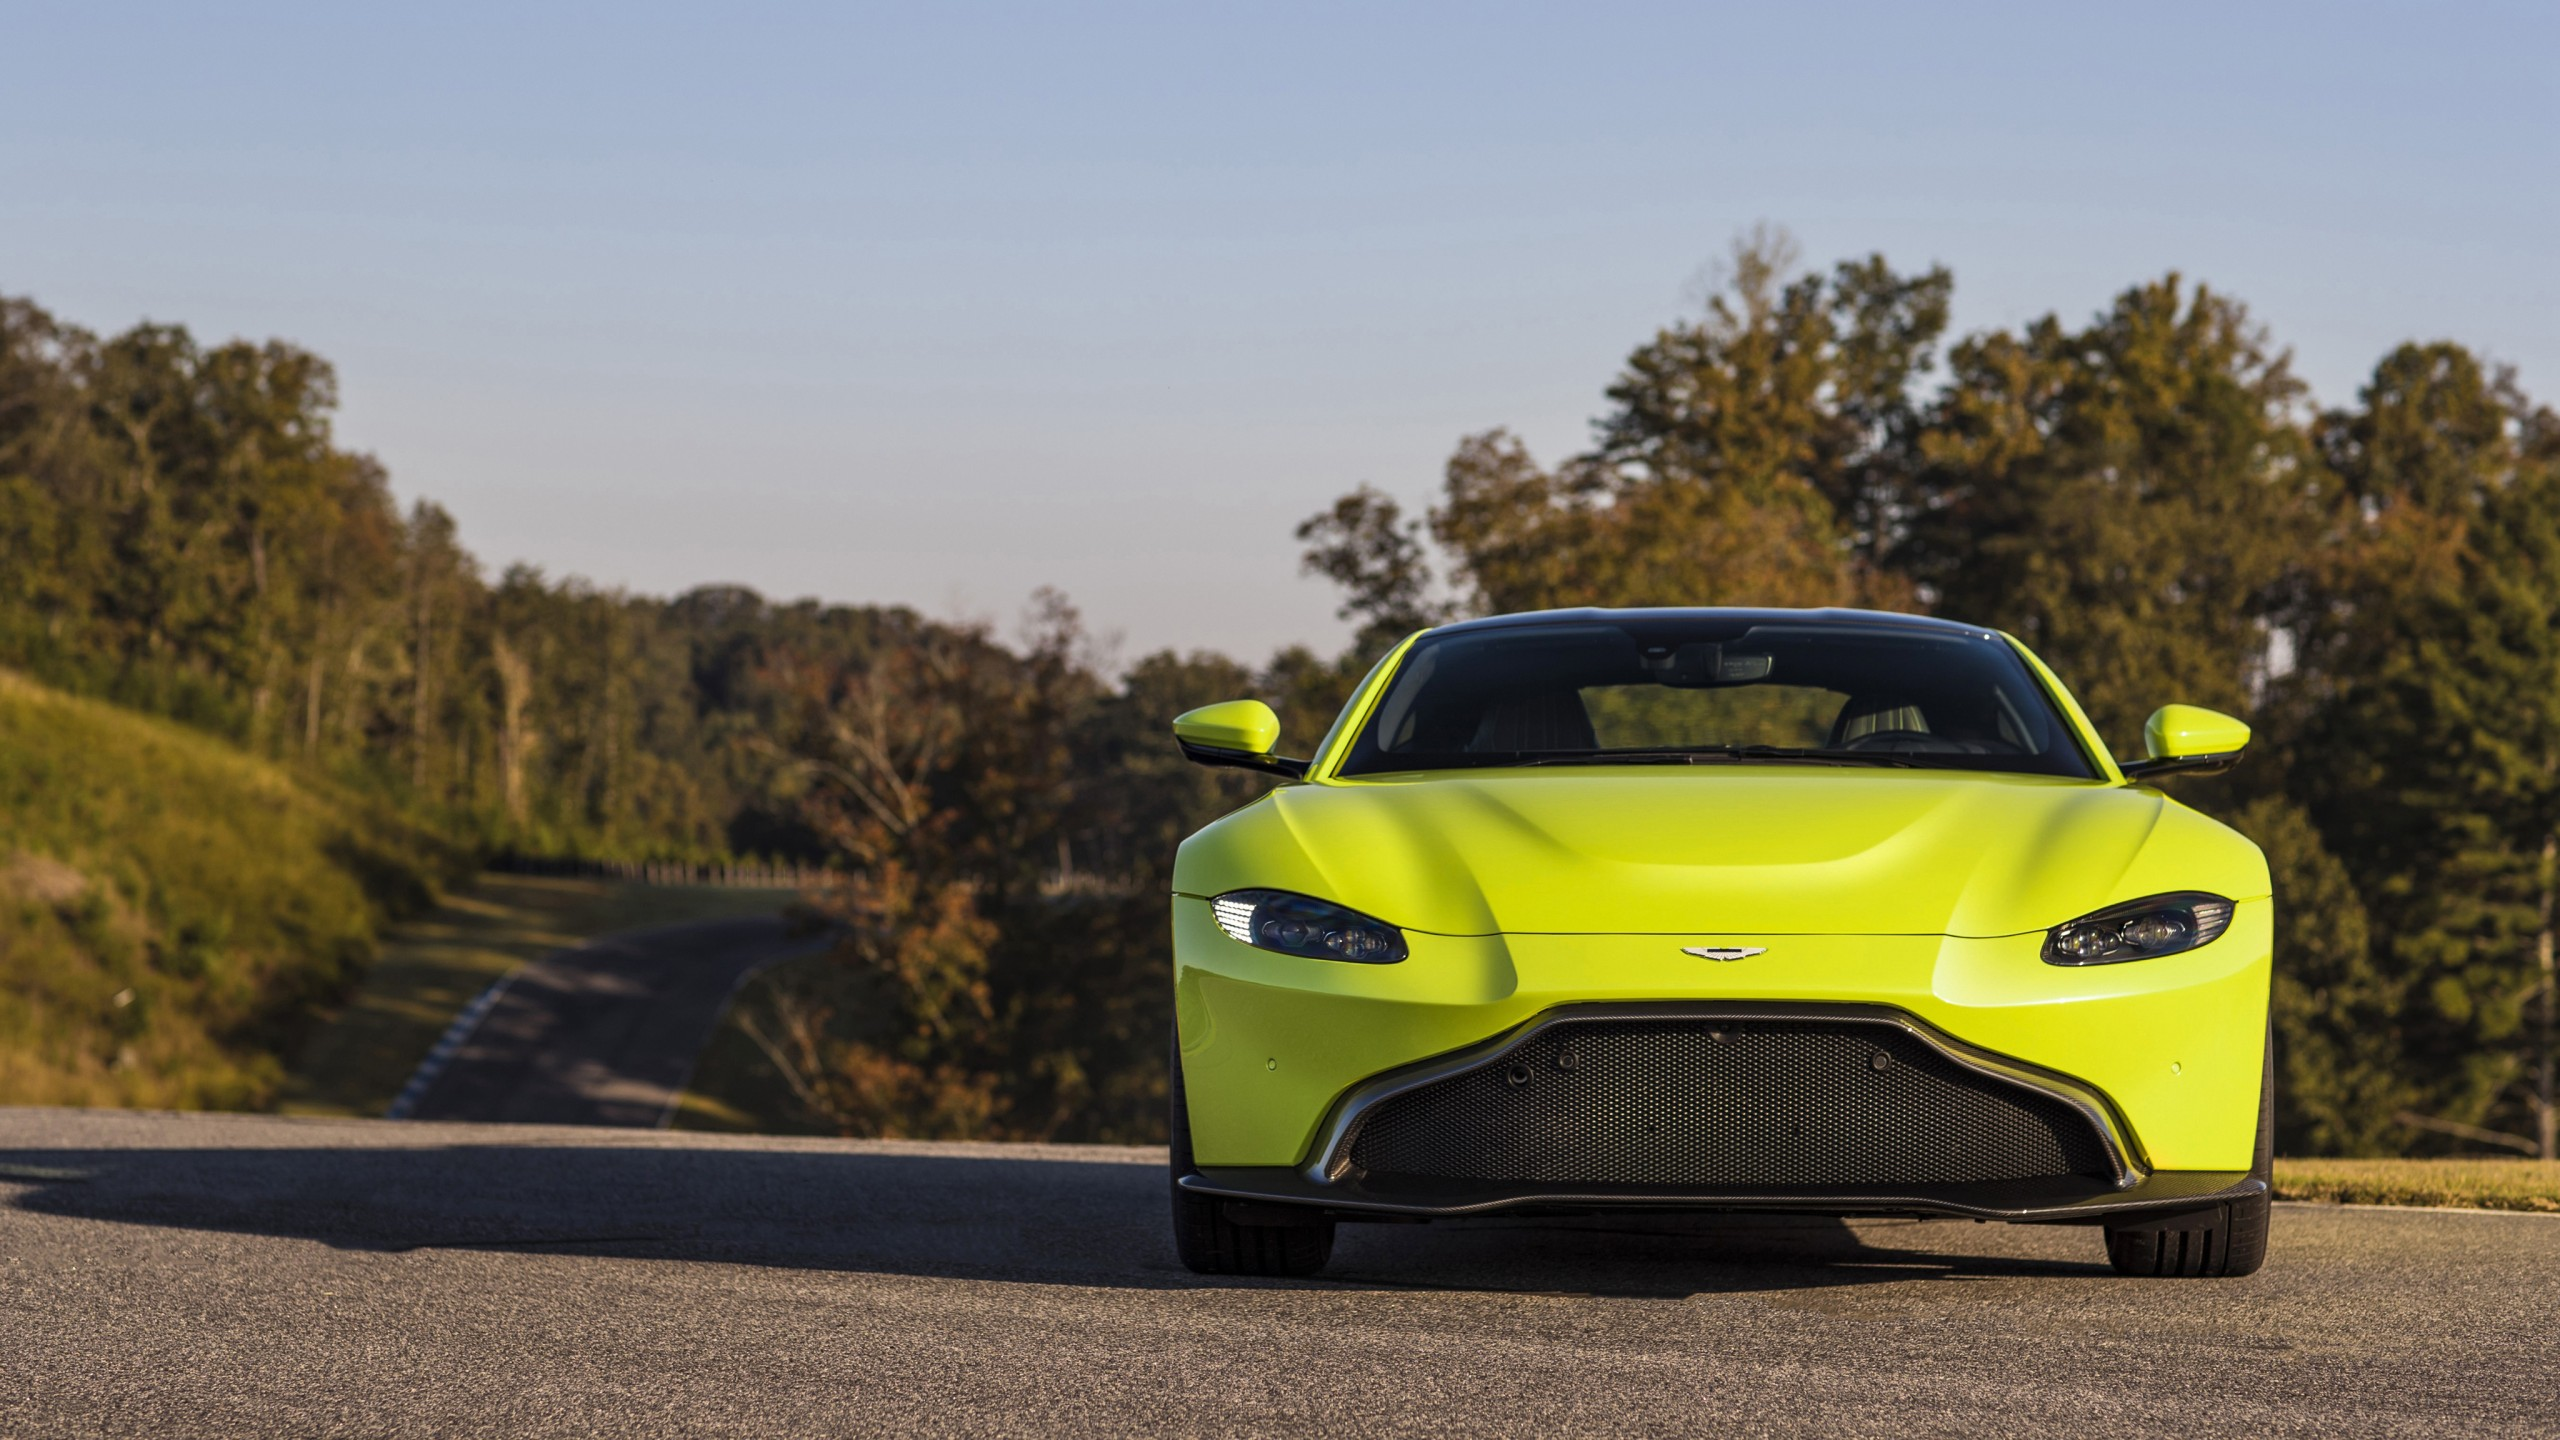 2018 Aston Martin Vantage 4k Wallpaper Hd Car Wallpapers Id 9145